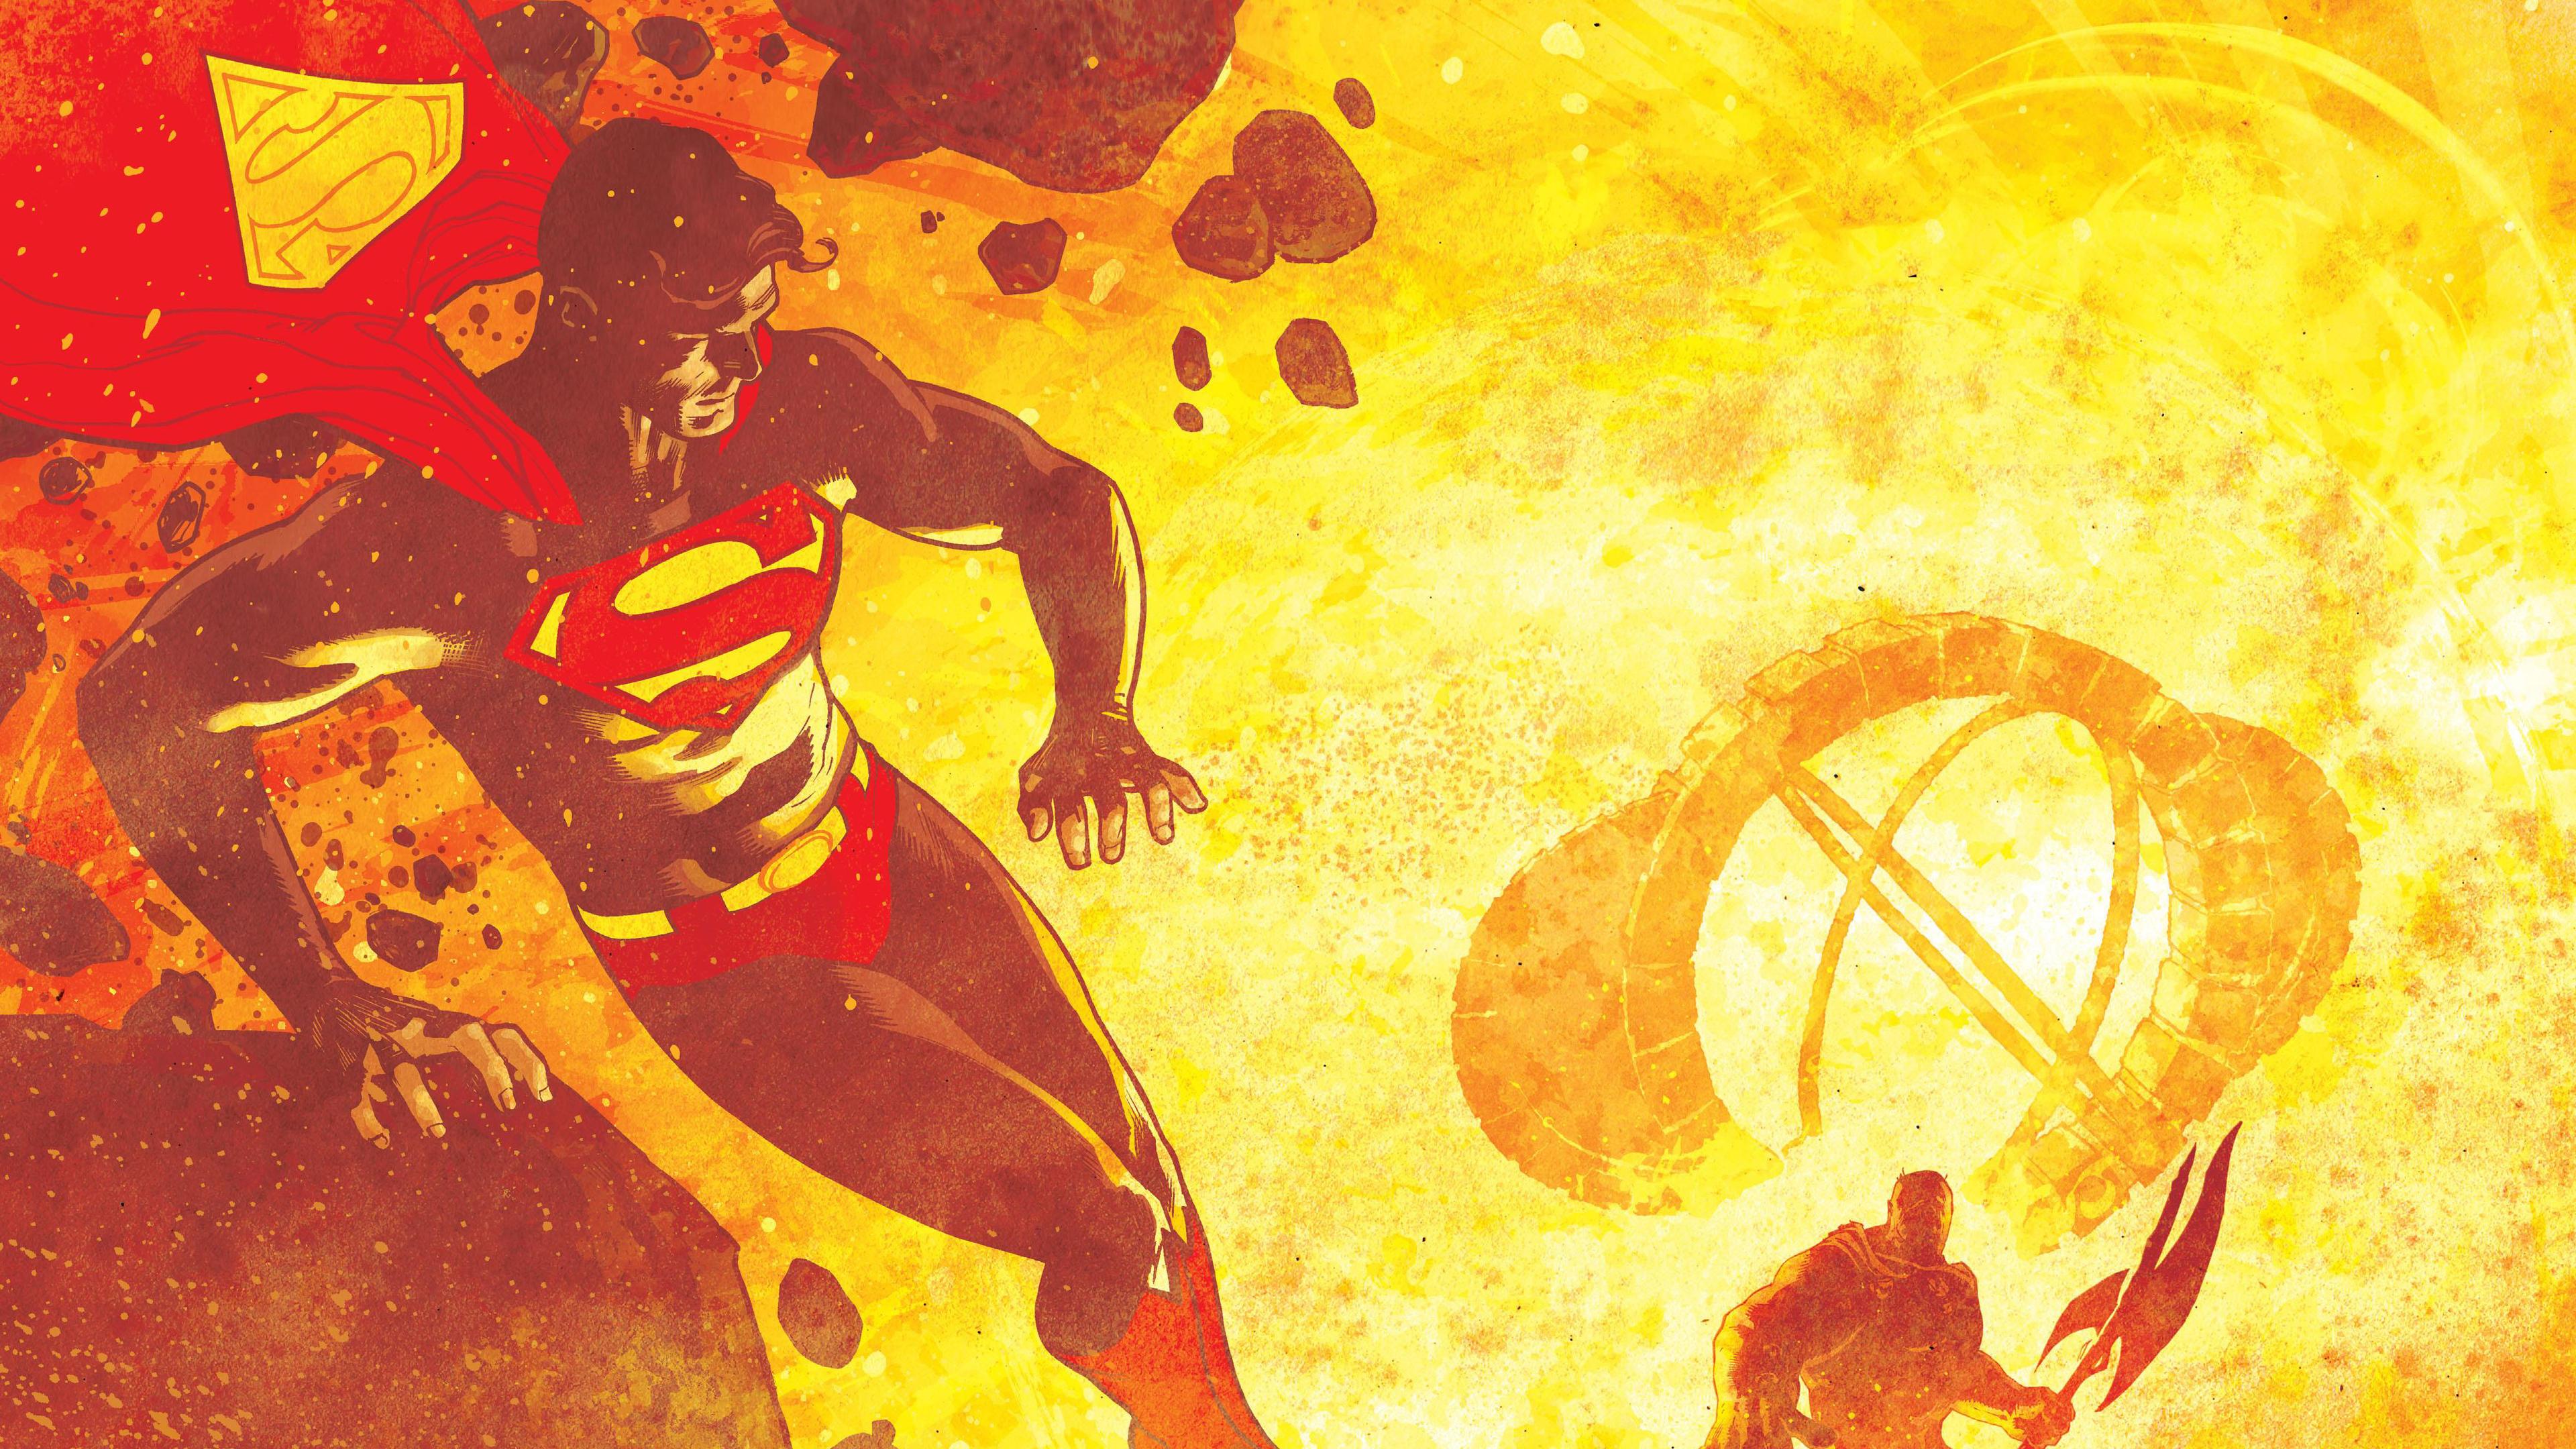 superman vs rogol zaar 4k 1545588709 - Superman Vs Rogol Zaar 4k - superman wallpapers, superheroes wallpapers, rogol zaar wallpapers, hd-wallpapers, 4k-wallpapers